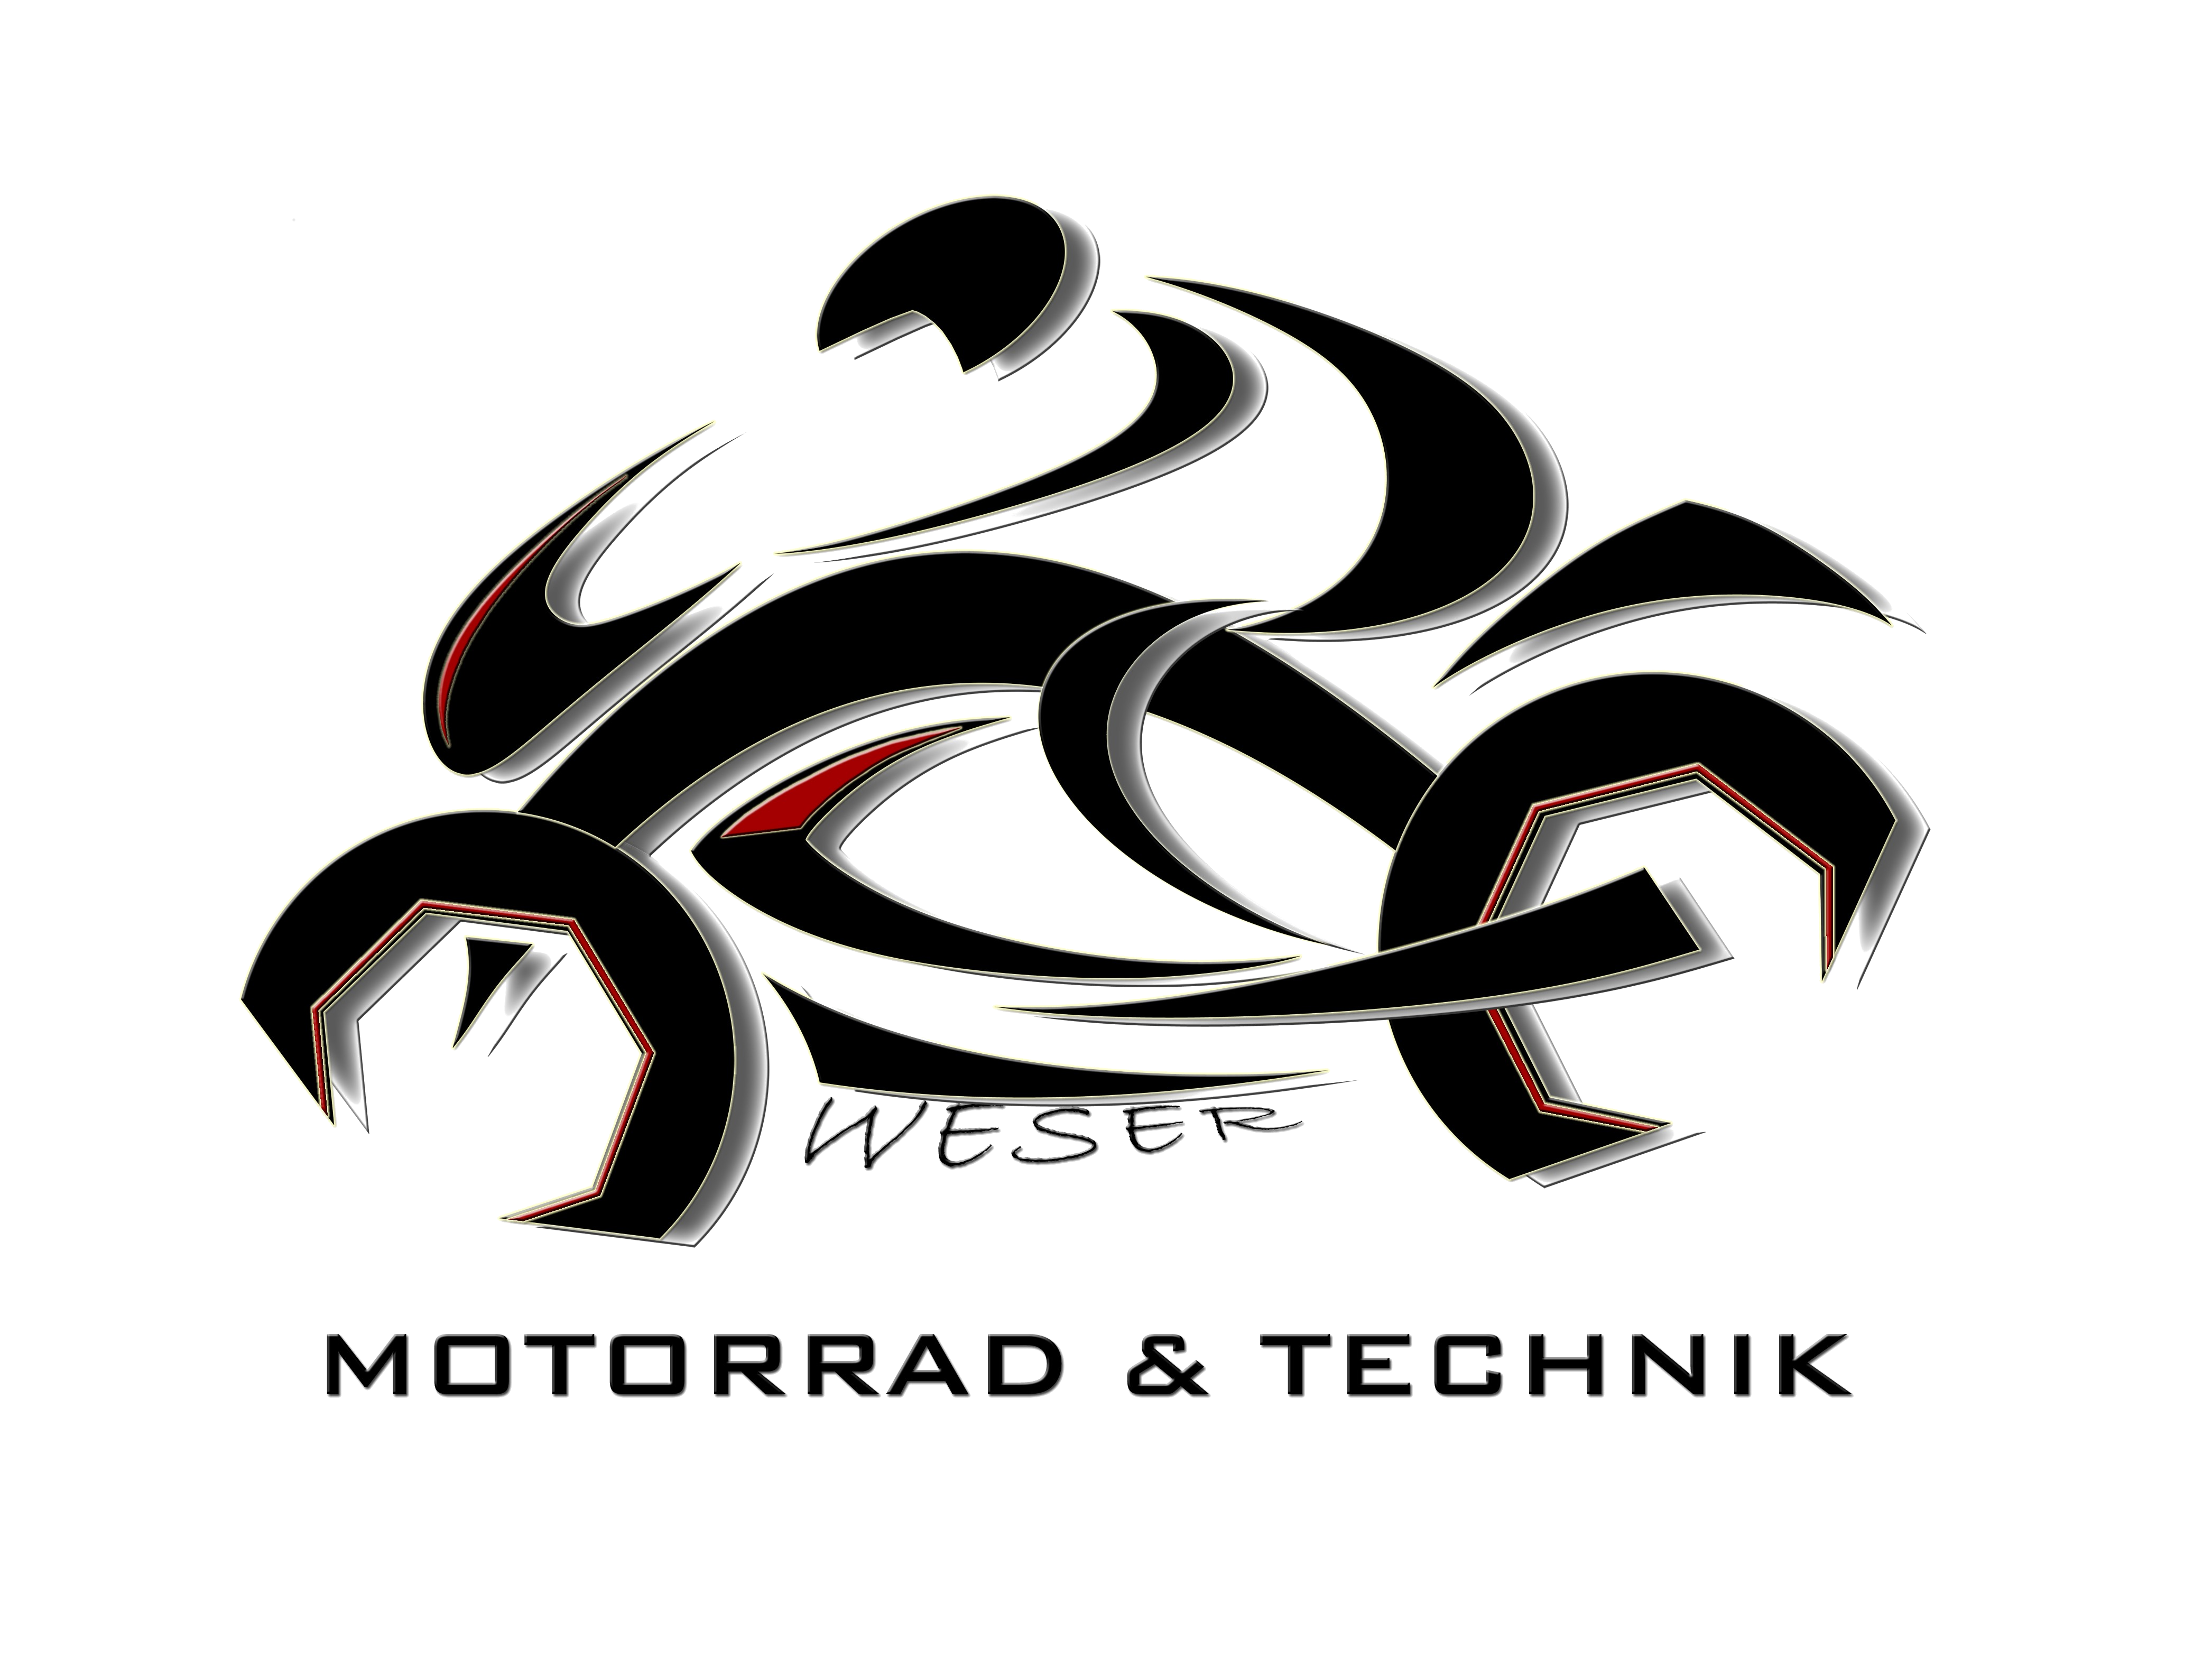 Motorrad und Technik Weser